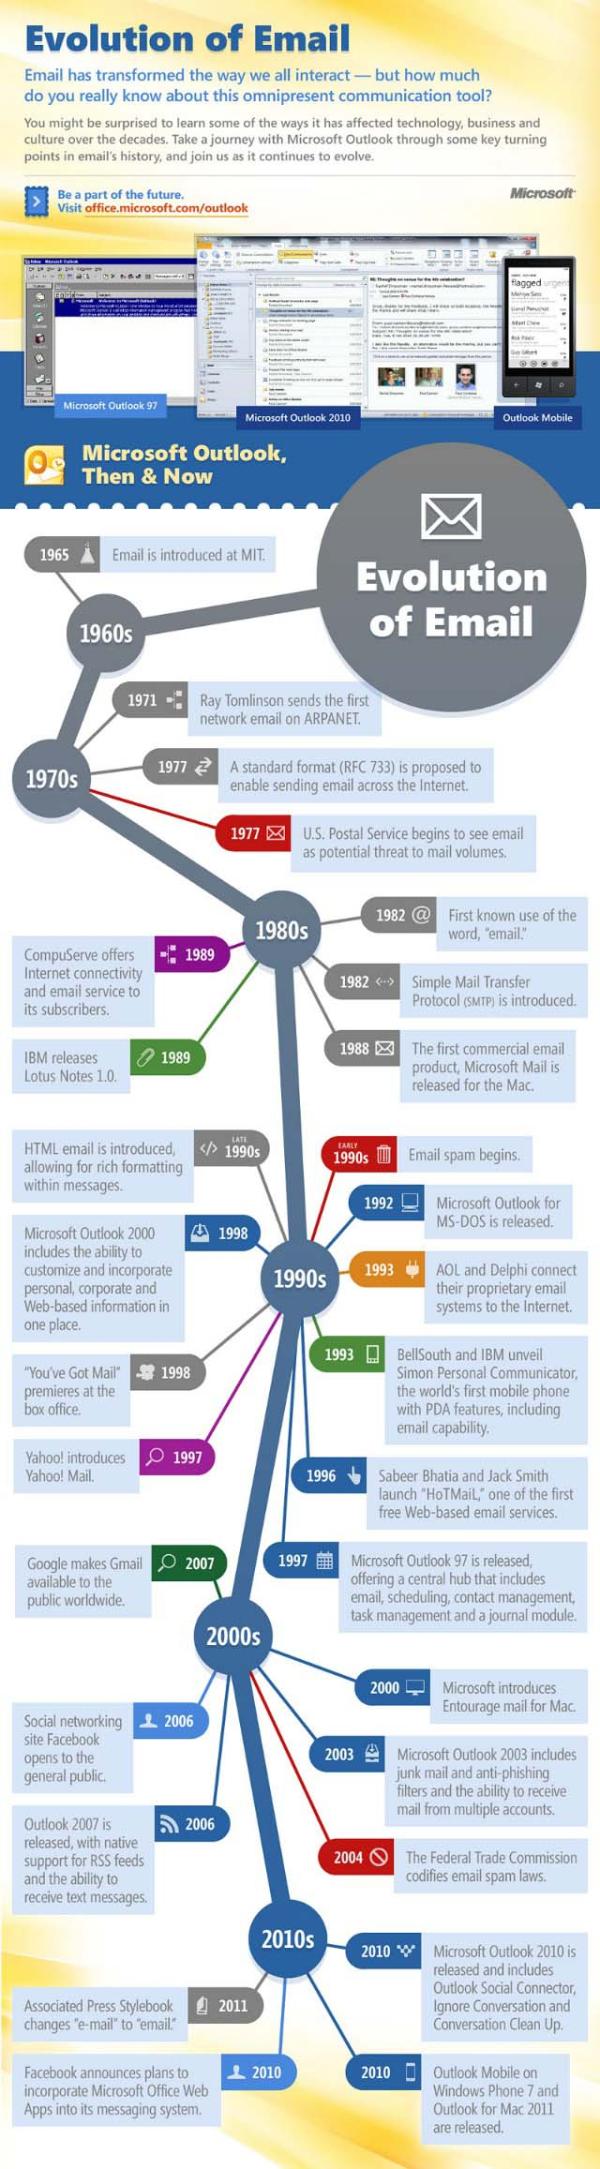 Evolution of Email1 resized 600